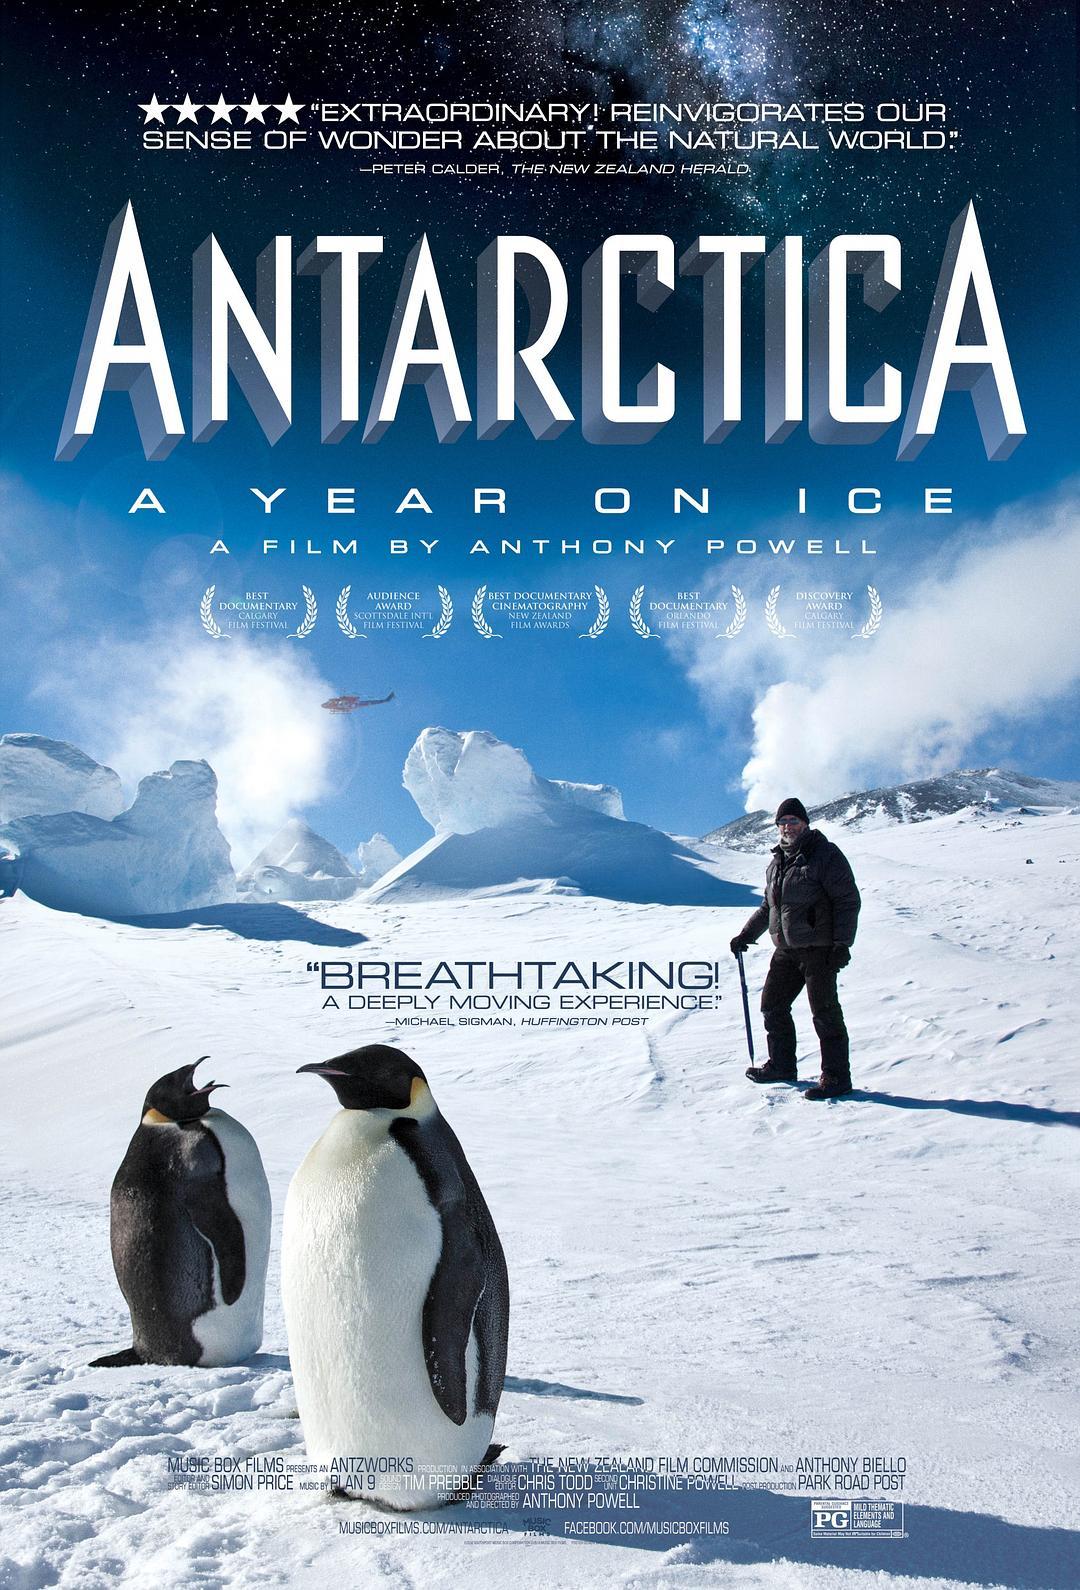 悠悠MP4_MP4电影下载_南极洲:冰上的一年 Antarctica.A.Year.on.Ice.2013.1080p.BluRay.x264-USURY 6.56GB